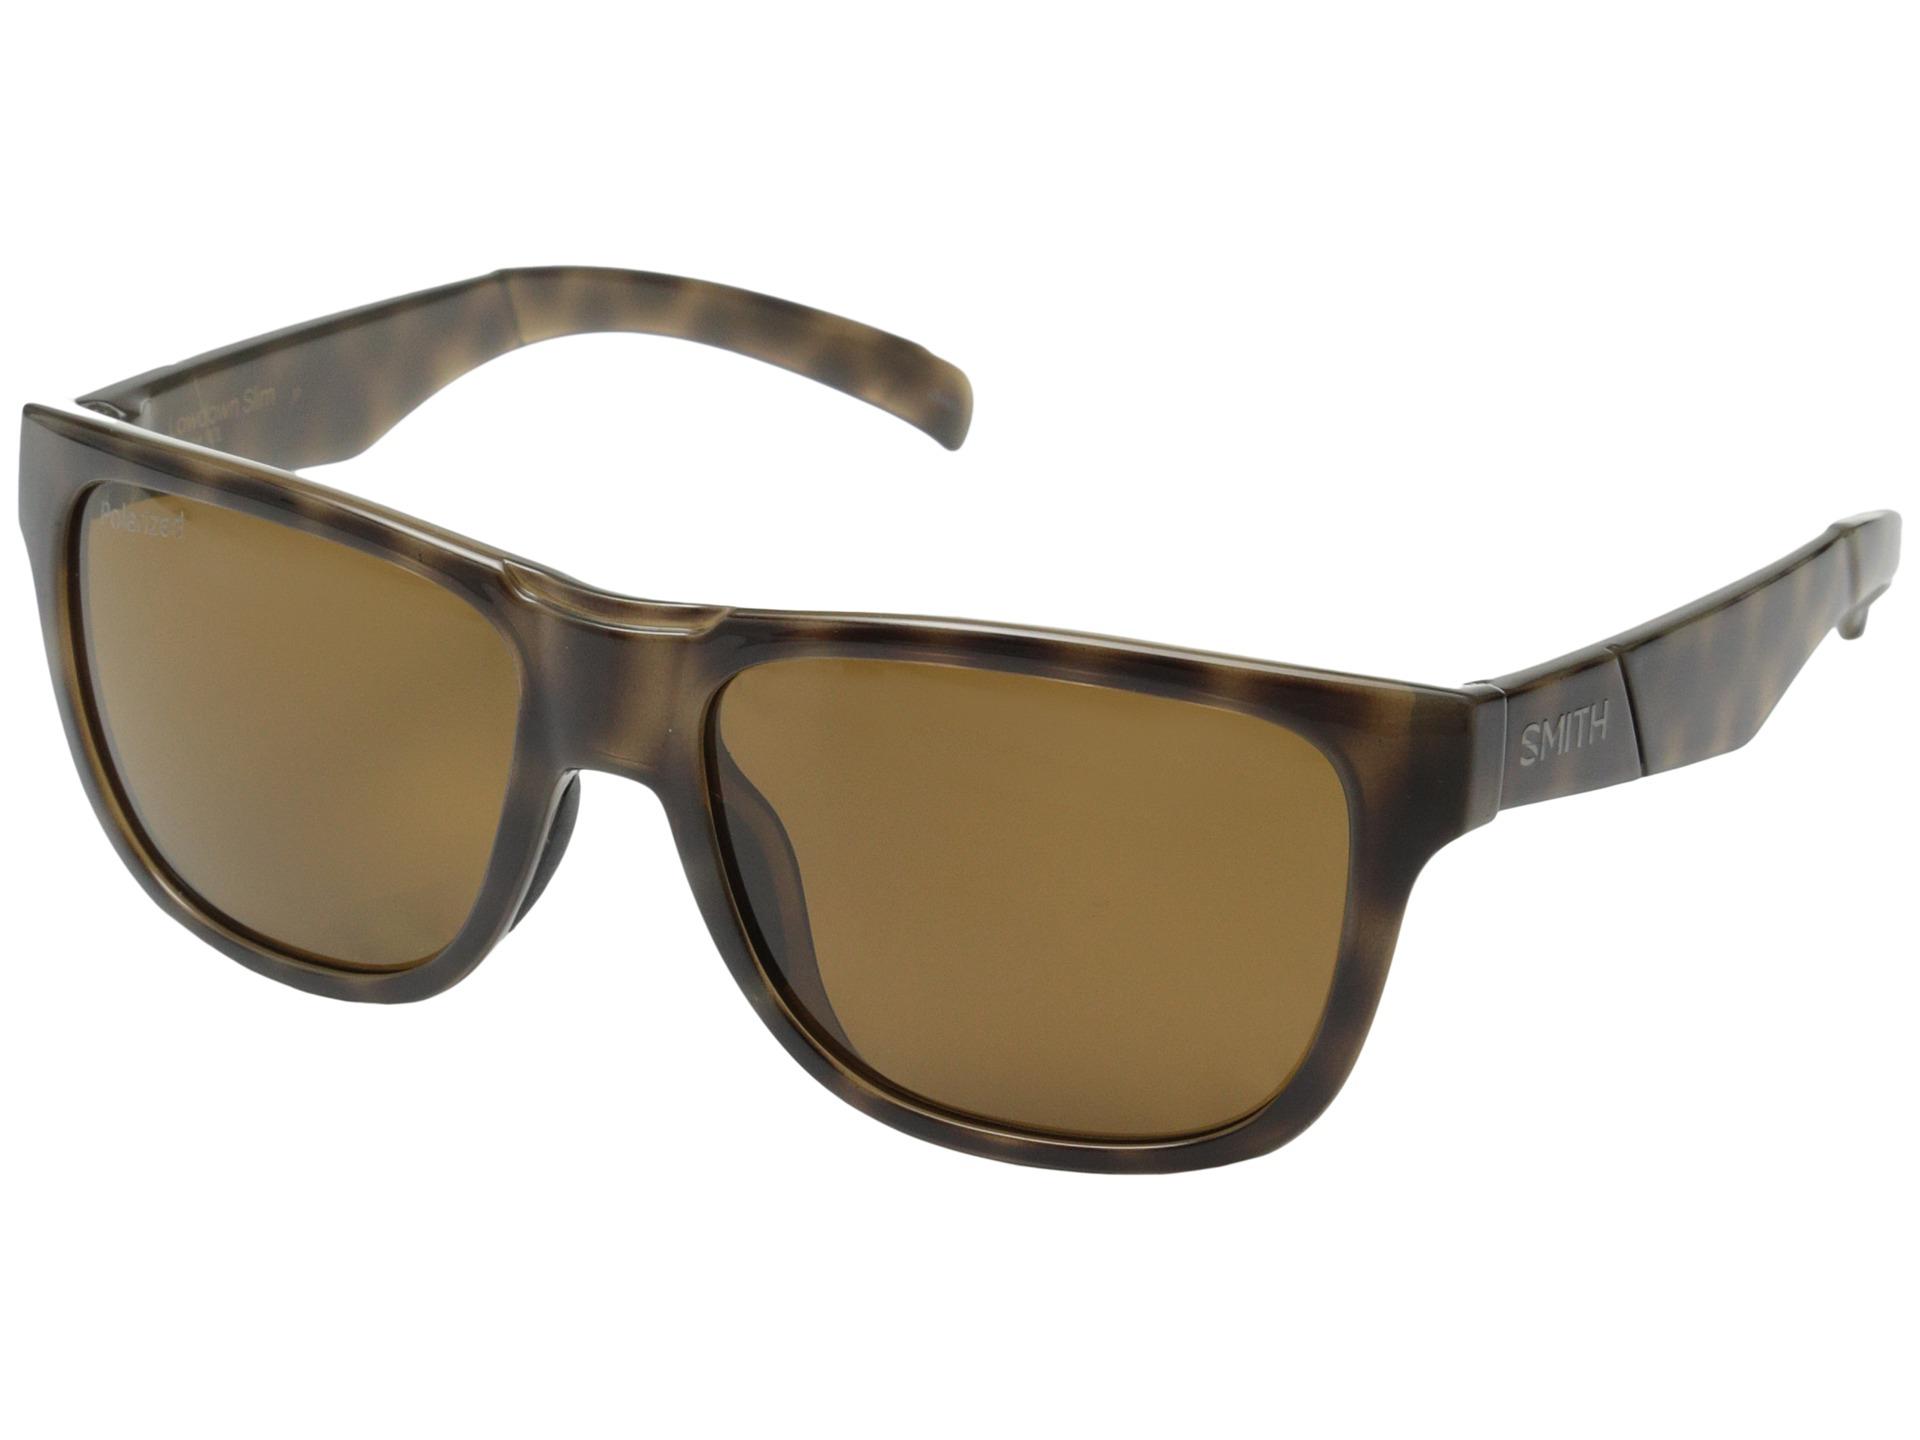 37d370f1a6b Smith Lowdown Slim Polarized Sunglasses - Women - Bitterroot Public ...